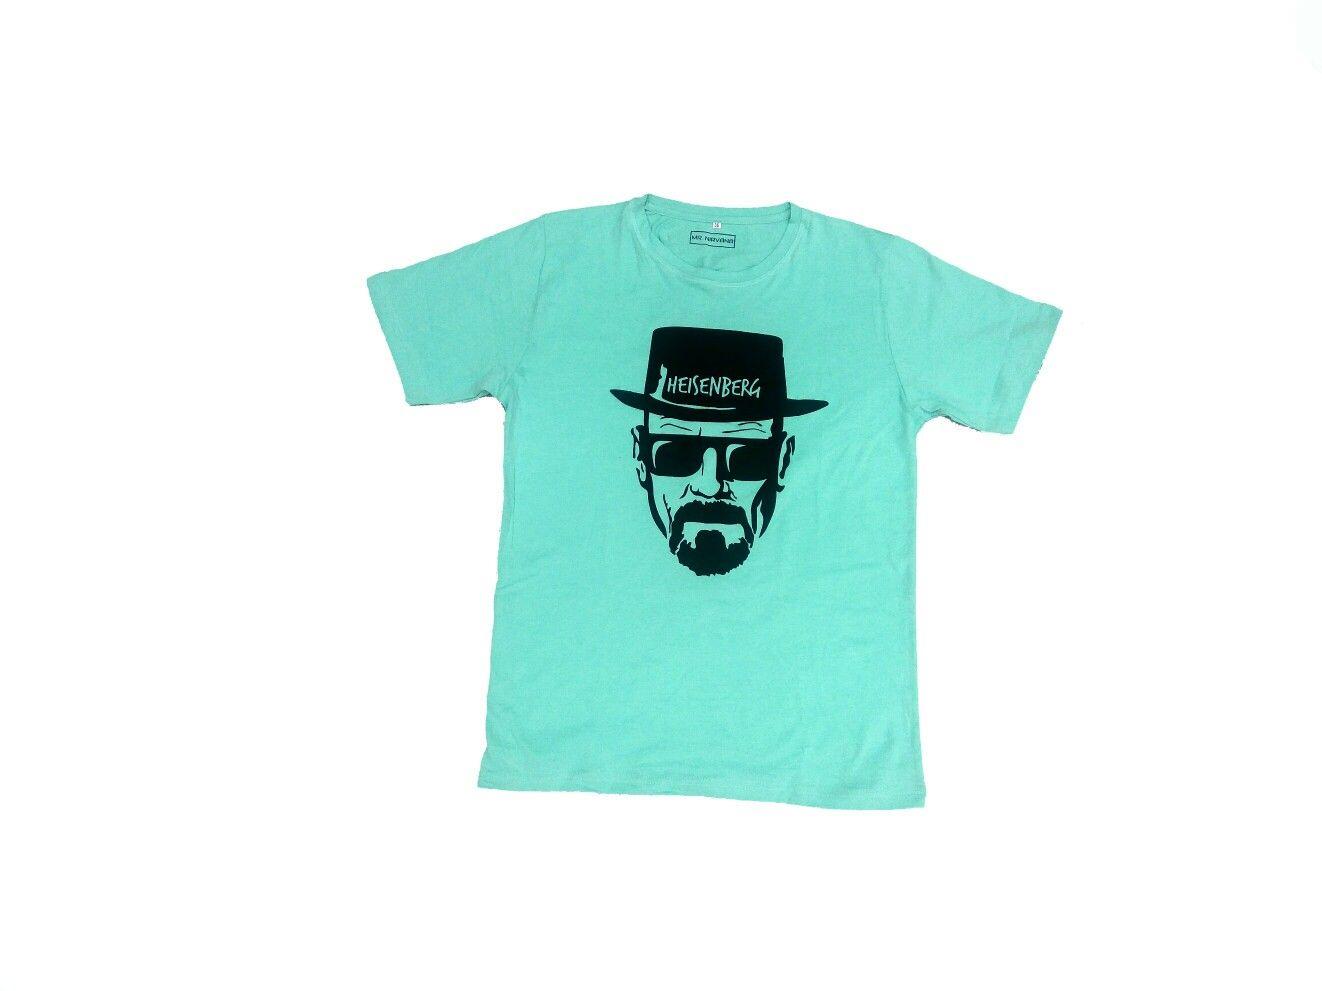 Cool Heisenberg (Breaking Bad) Tshirt only for 399 INR